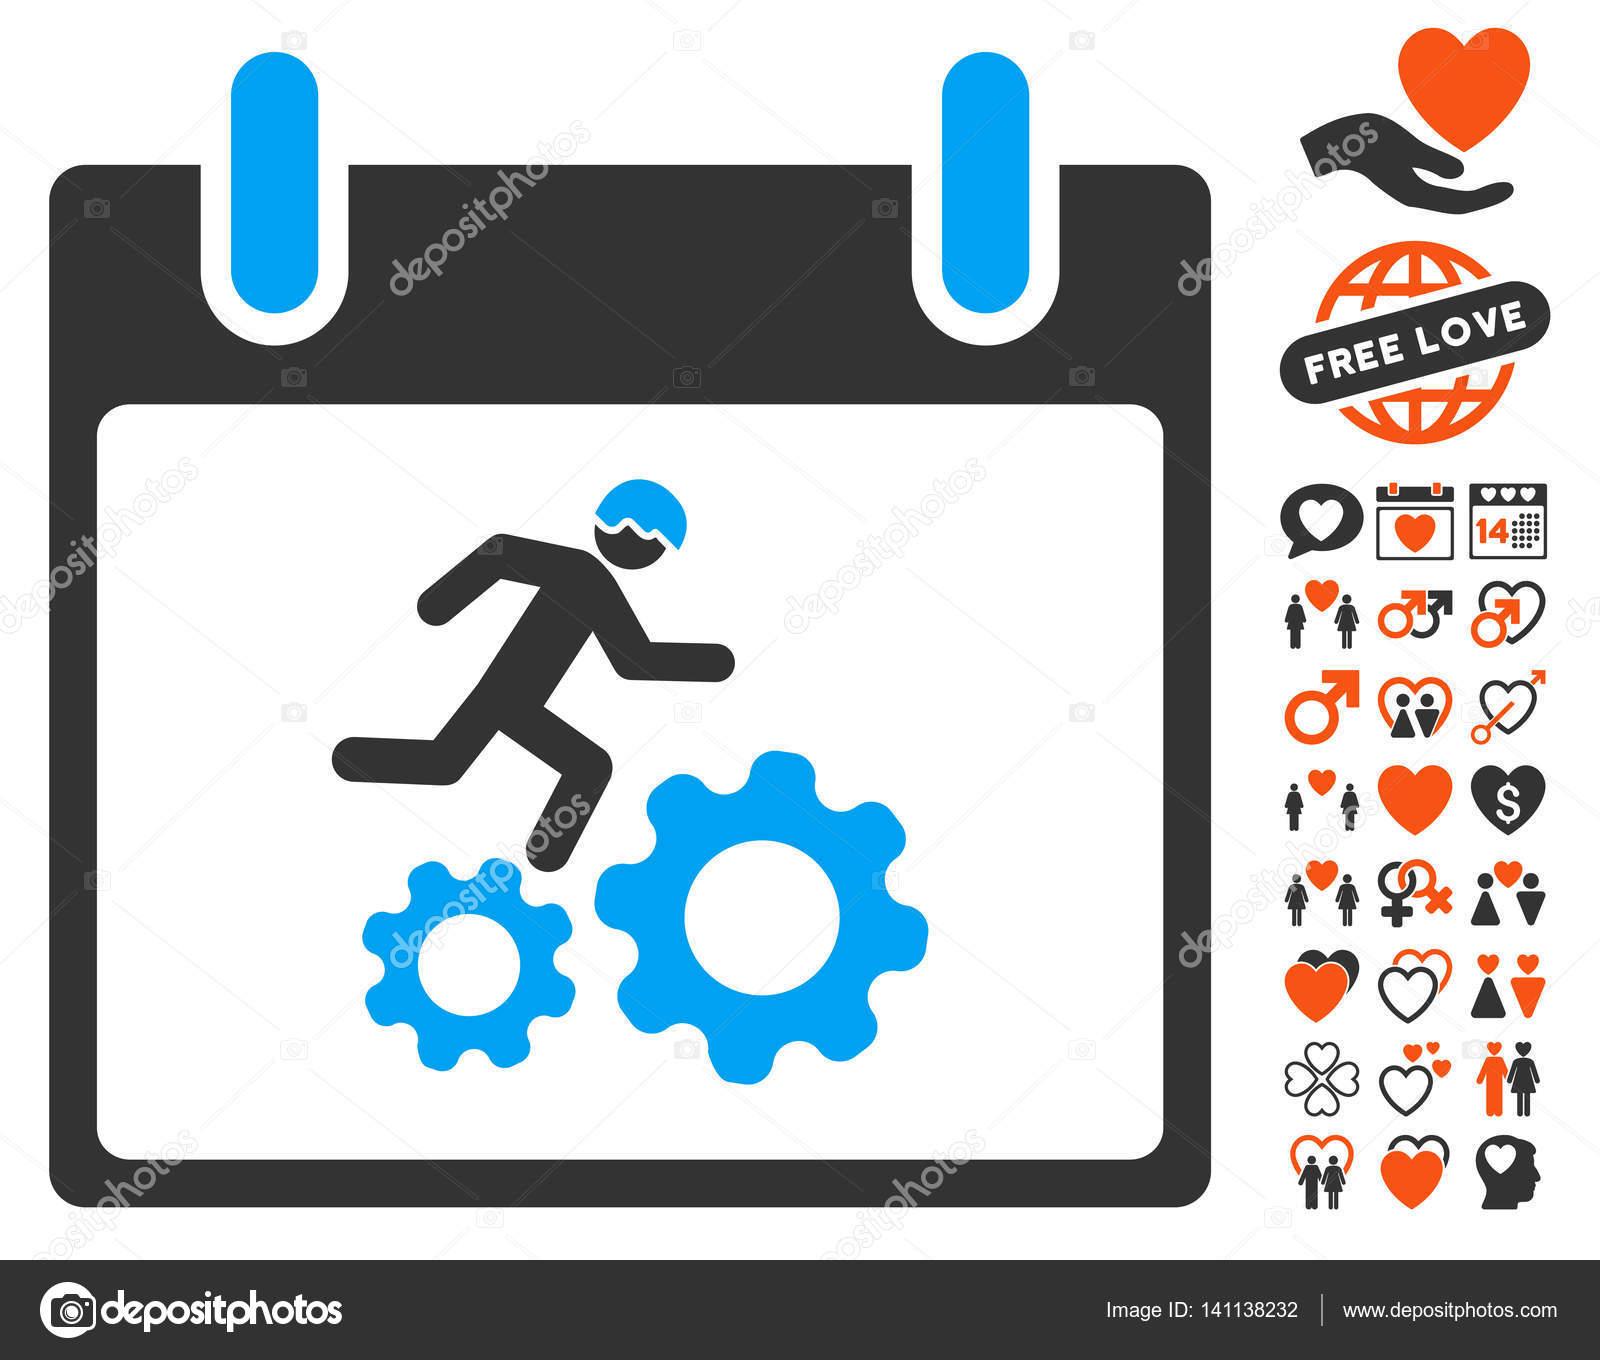 Runners dating app